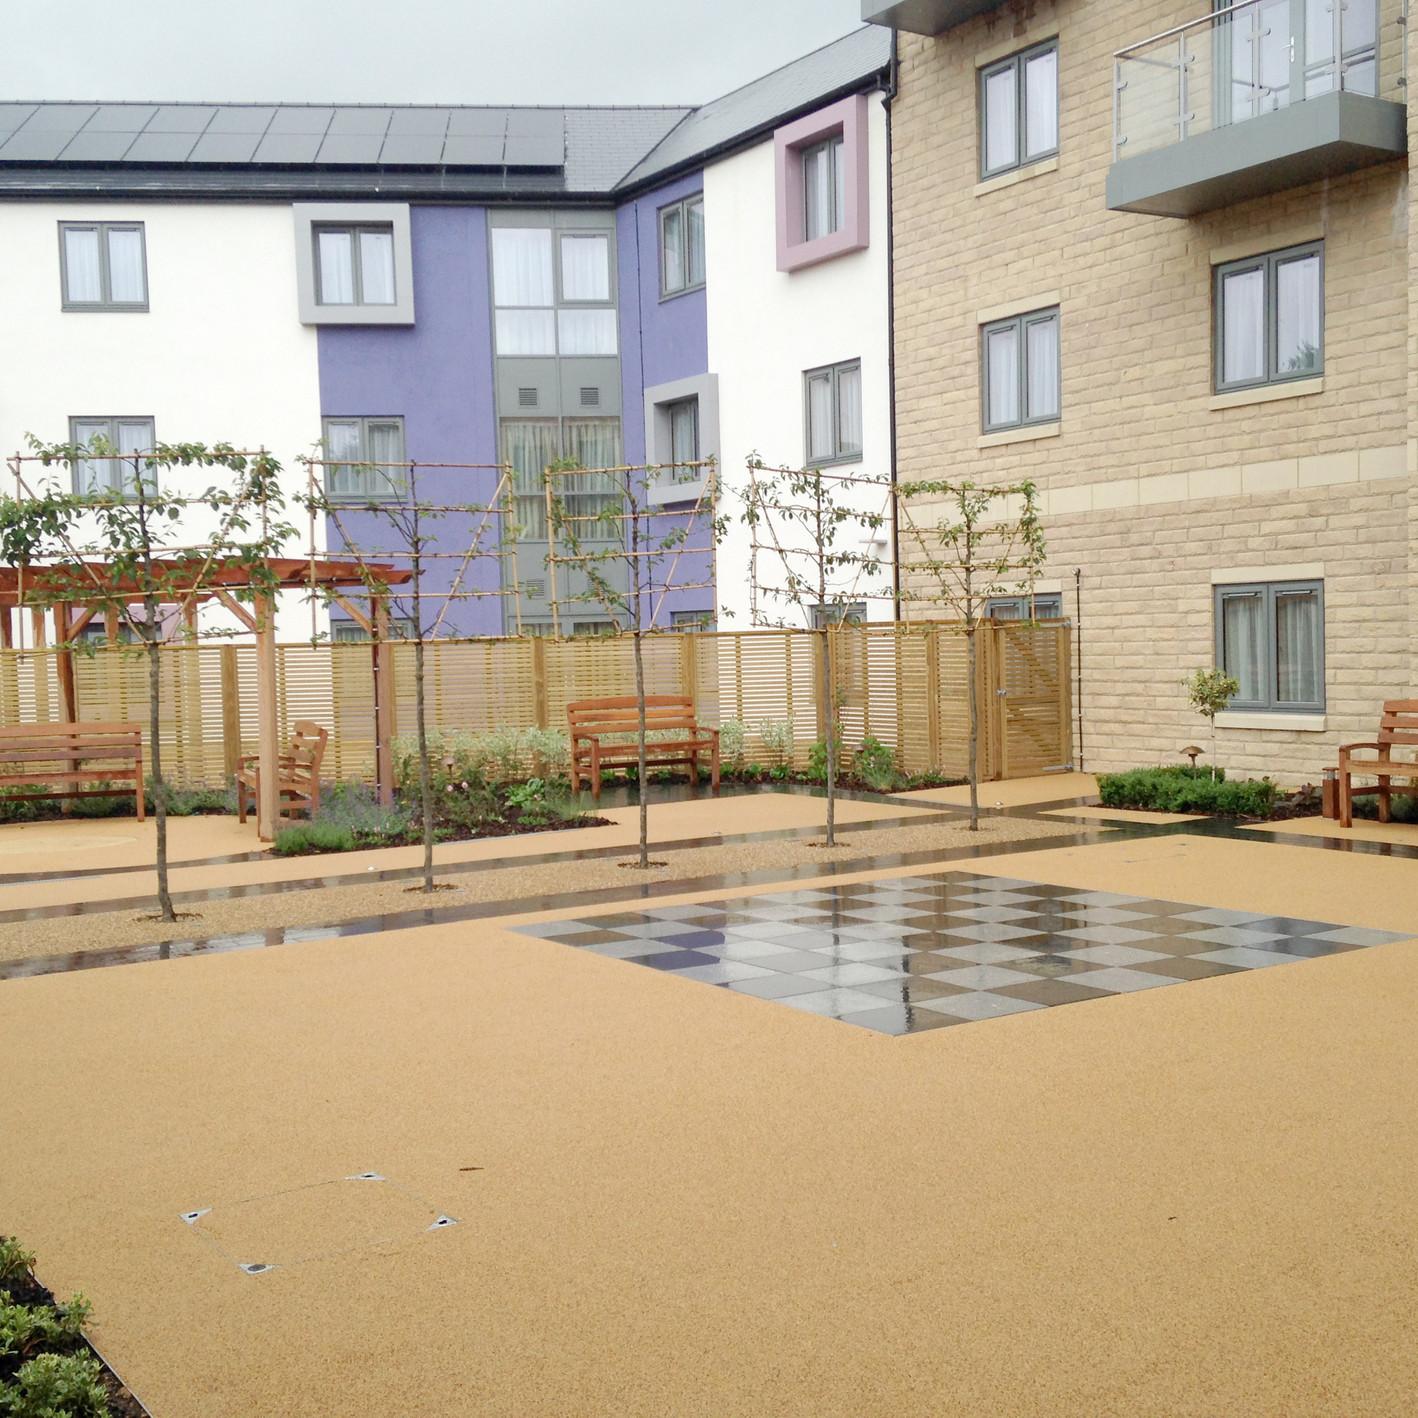 Fernbank image Courtyard garden 2.jpg